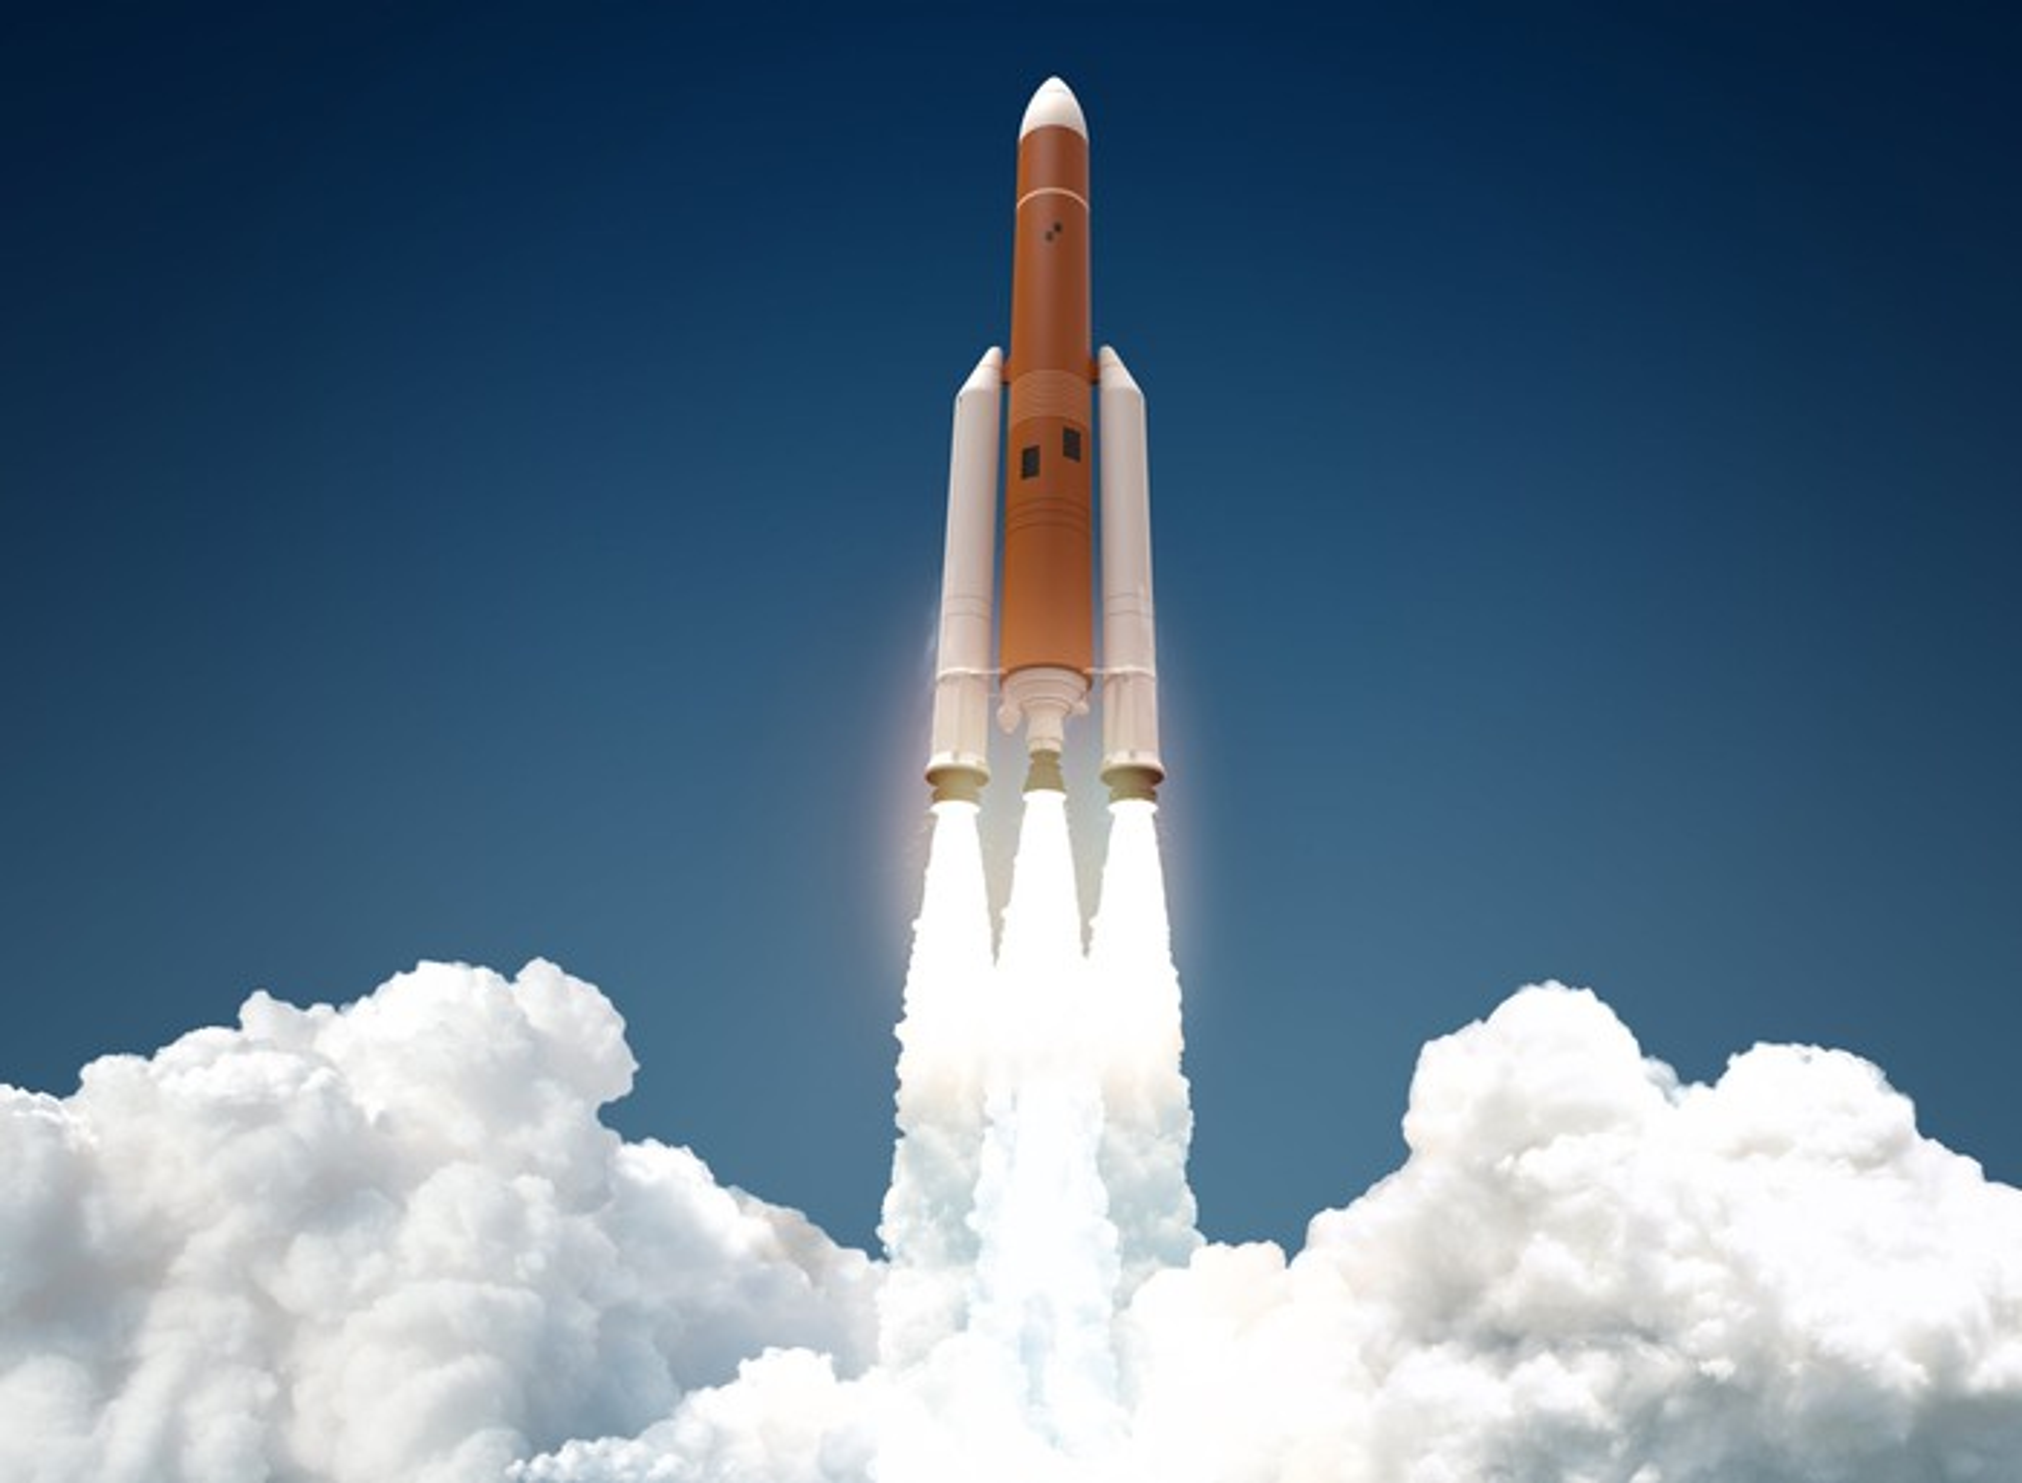 Rocket blasting off.